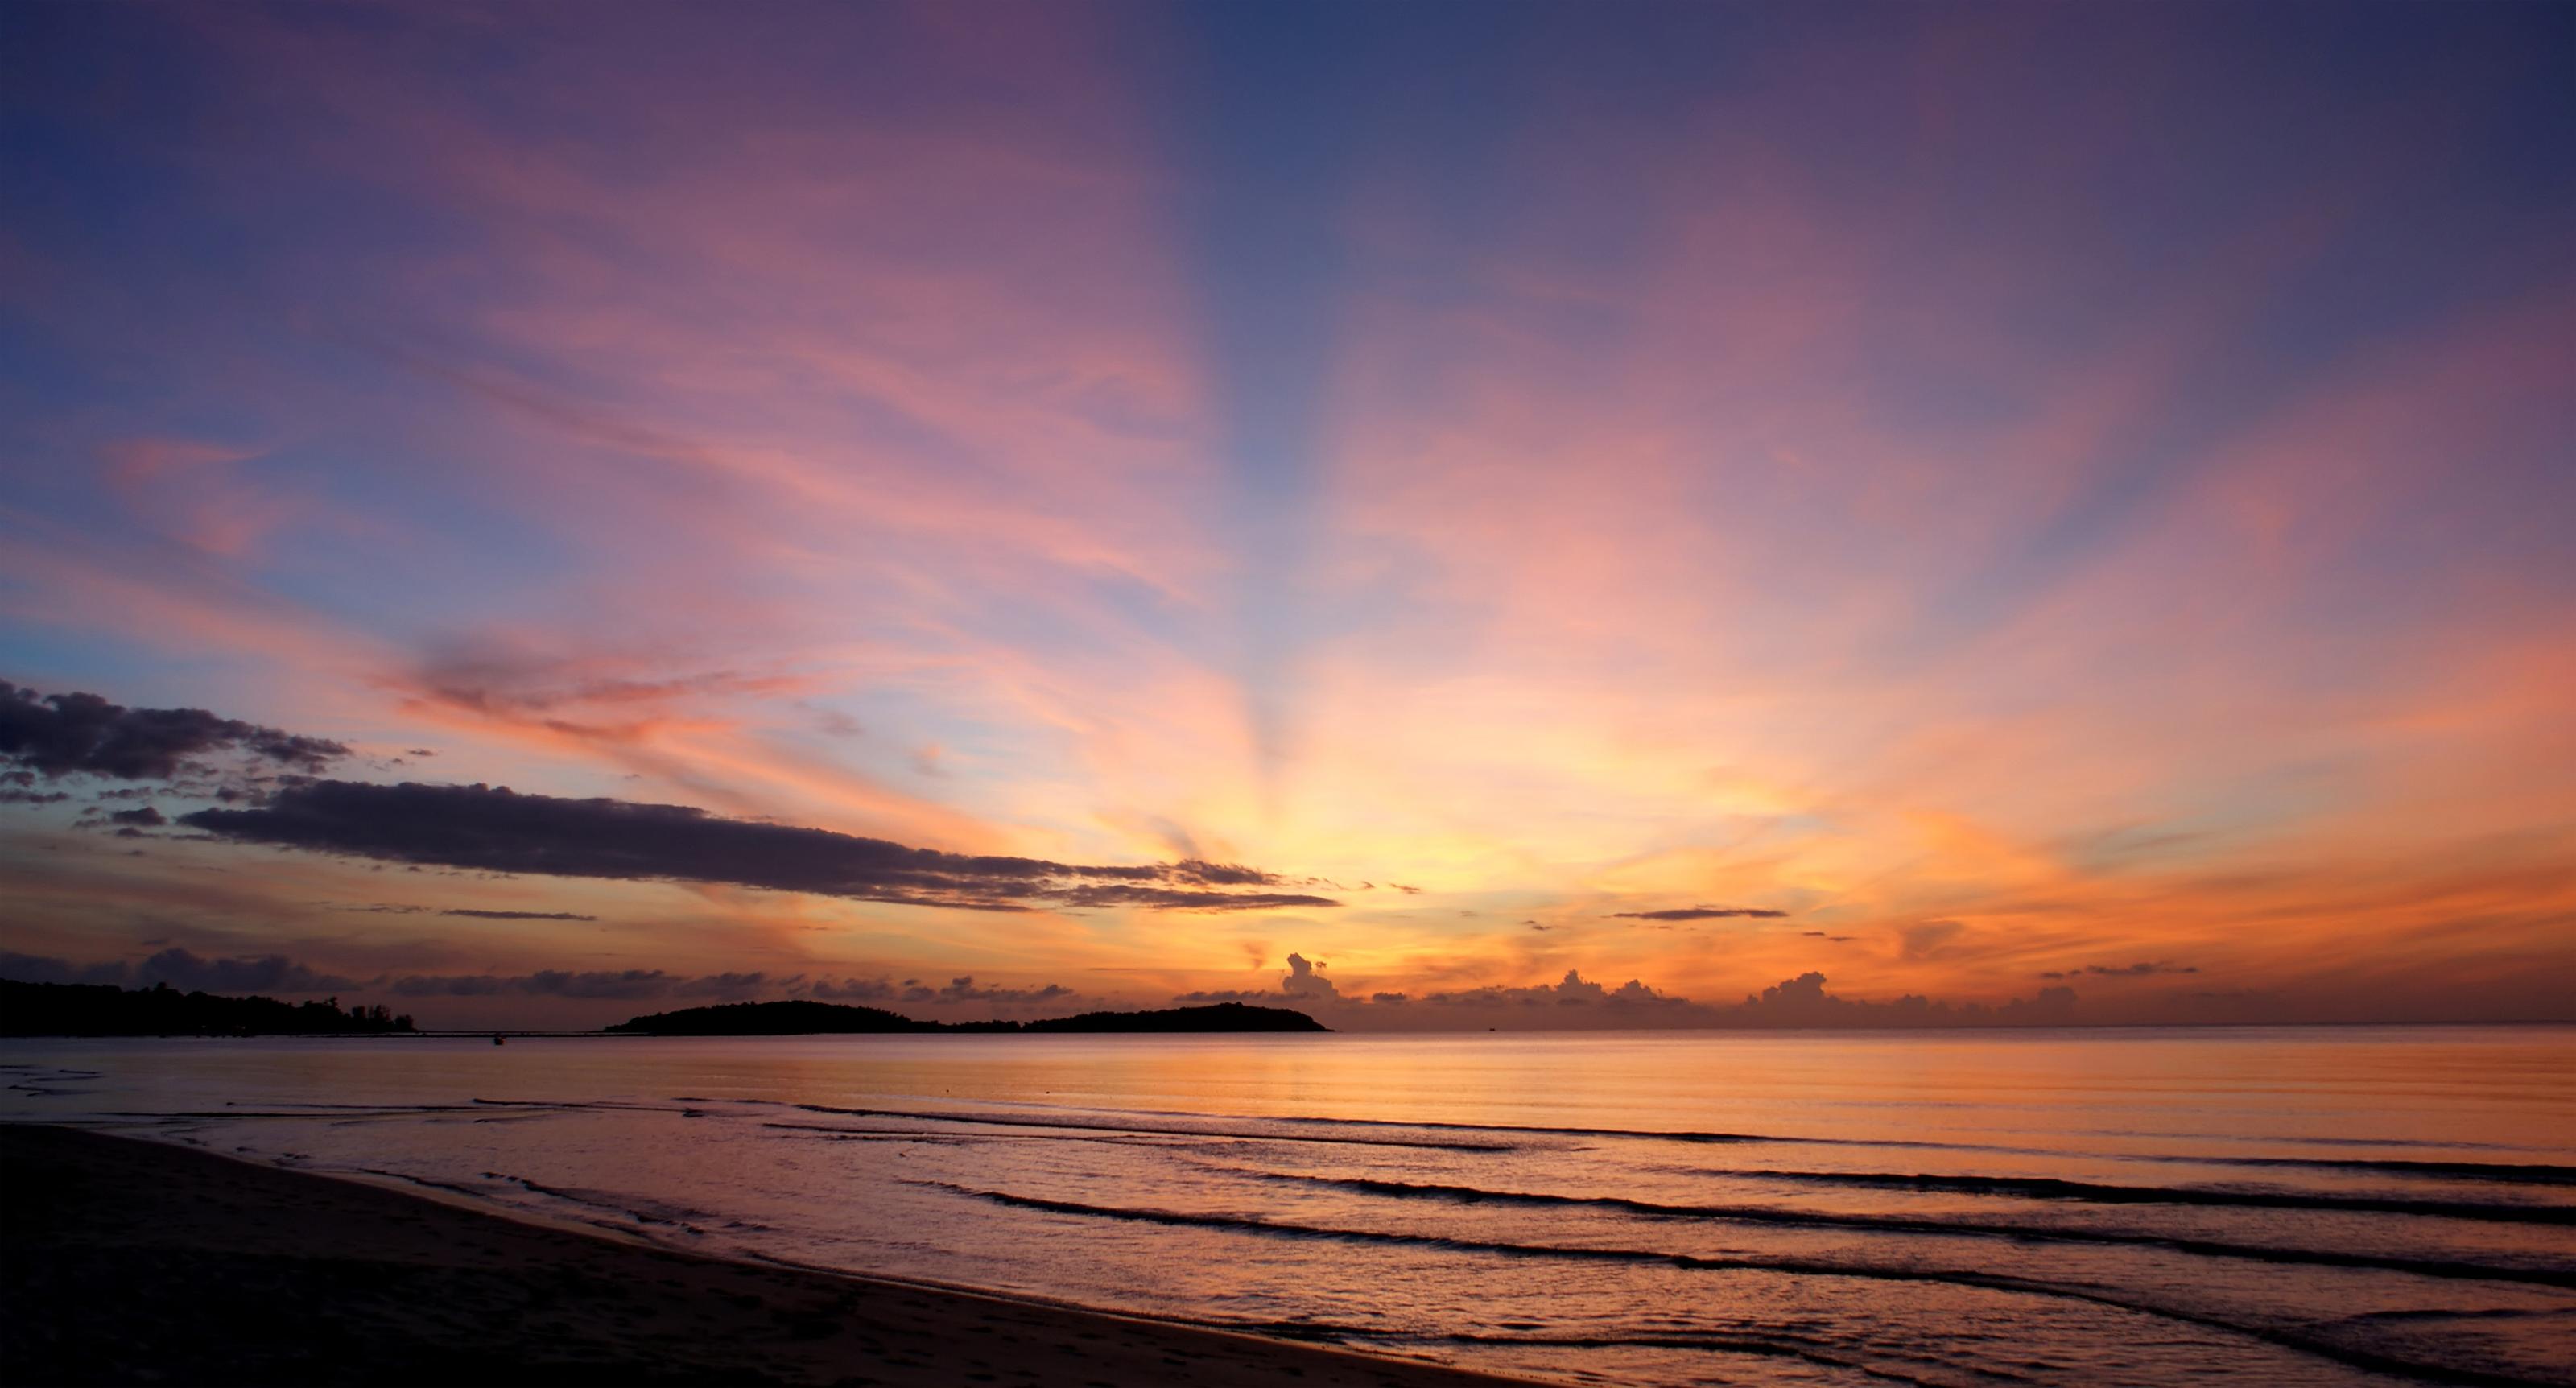 sunrise, euphoric, ray of light